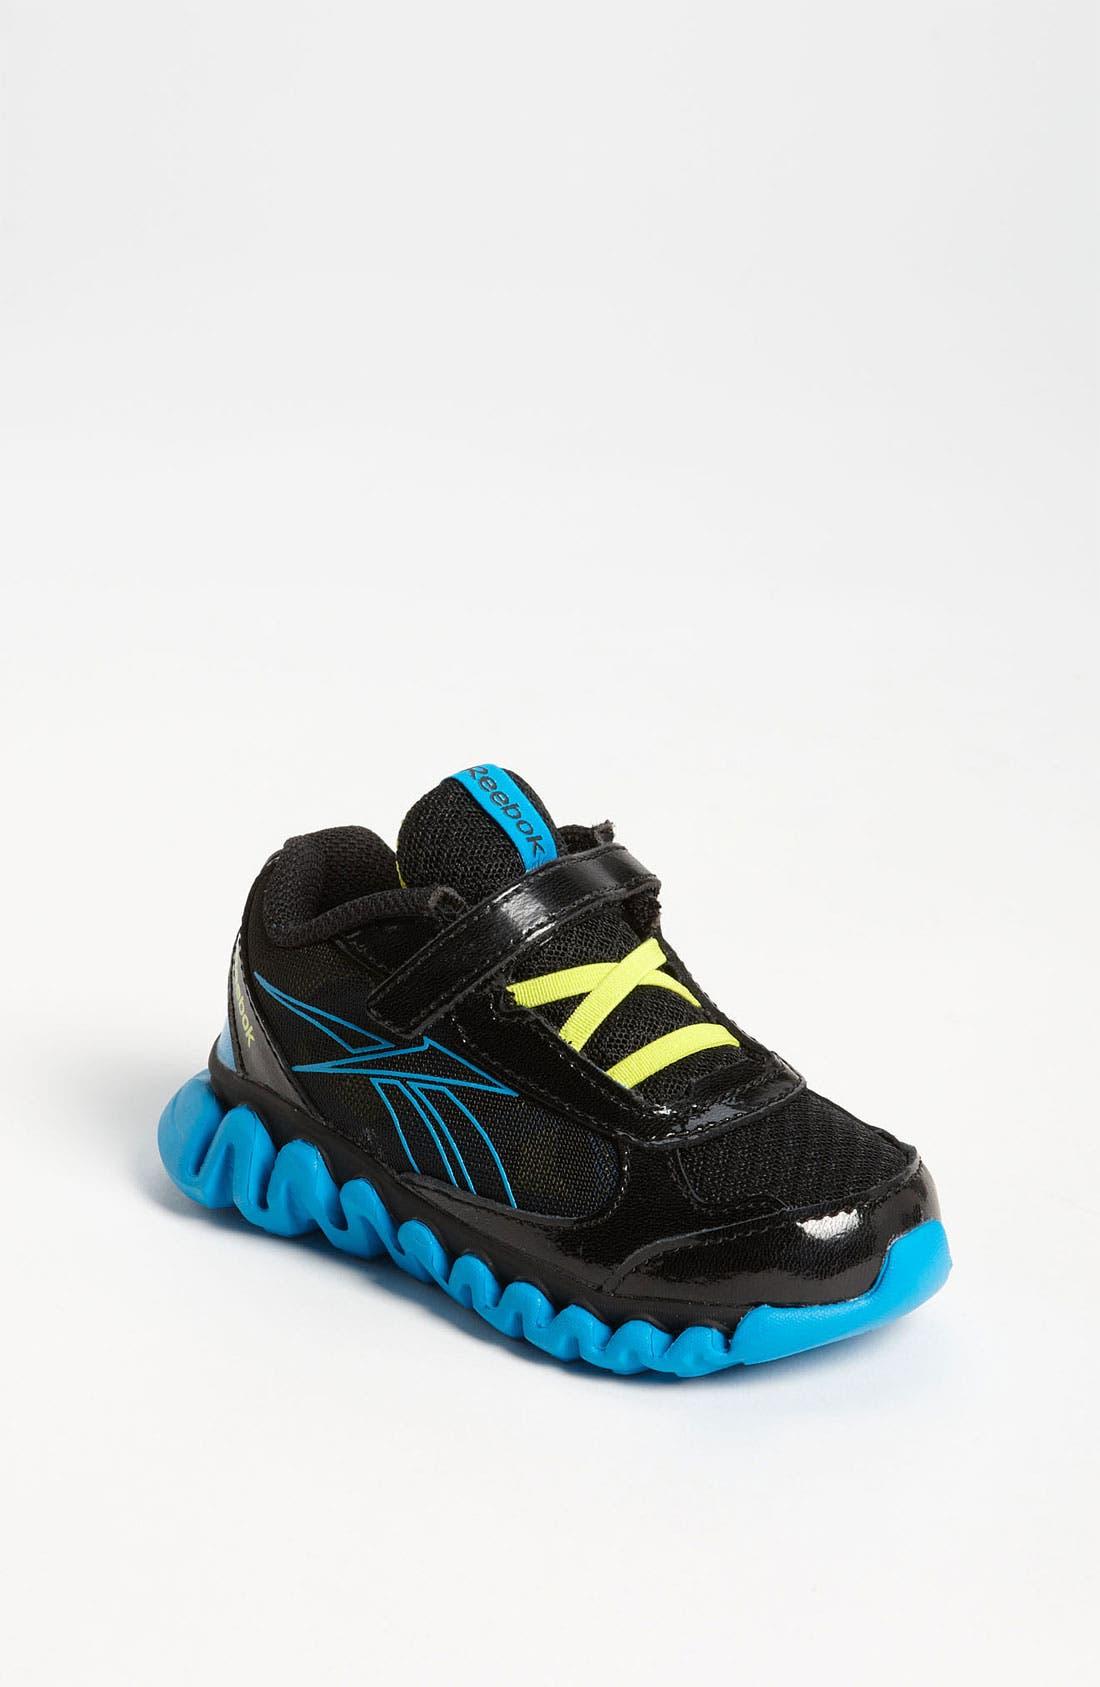 Alternate Image 1 Selected - Reebok 'Mini ZigLite Rush' Sneaker (Baby, Walker & Toddler)